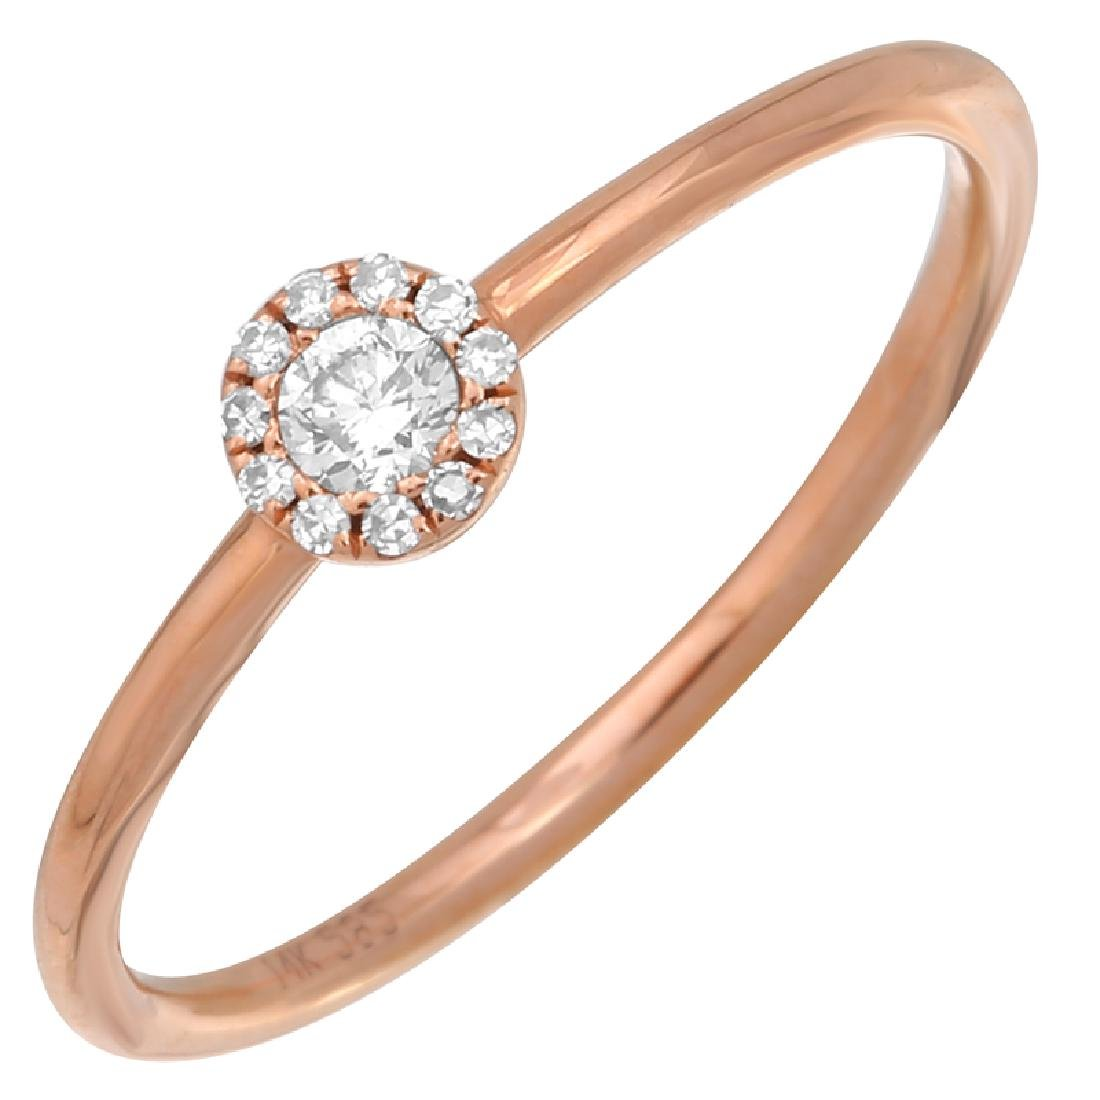 14KT Rose Gold 0.10ctw Women's Diamond Ring Size 6.5